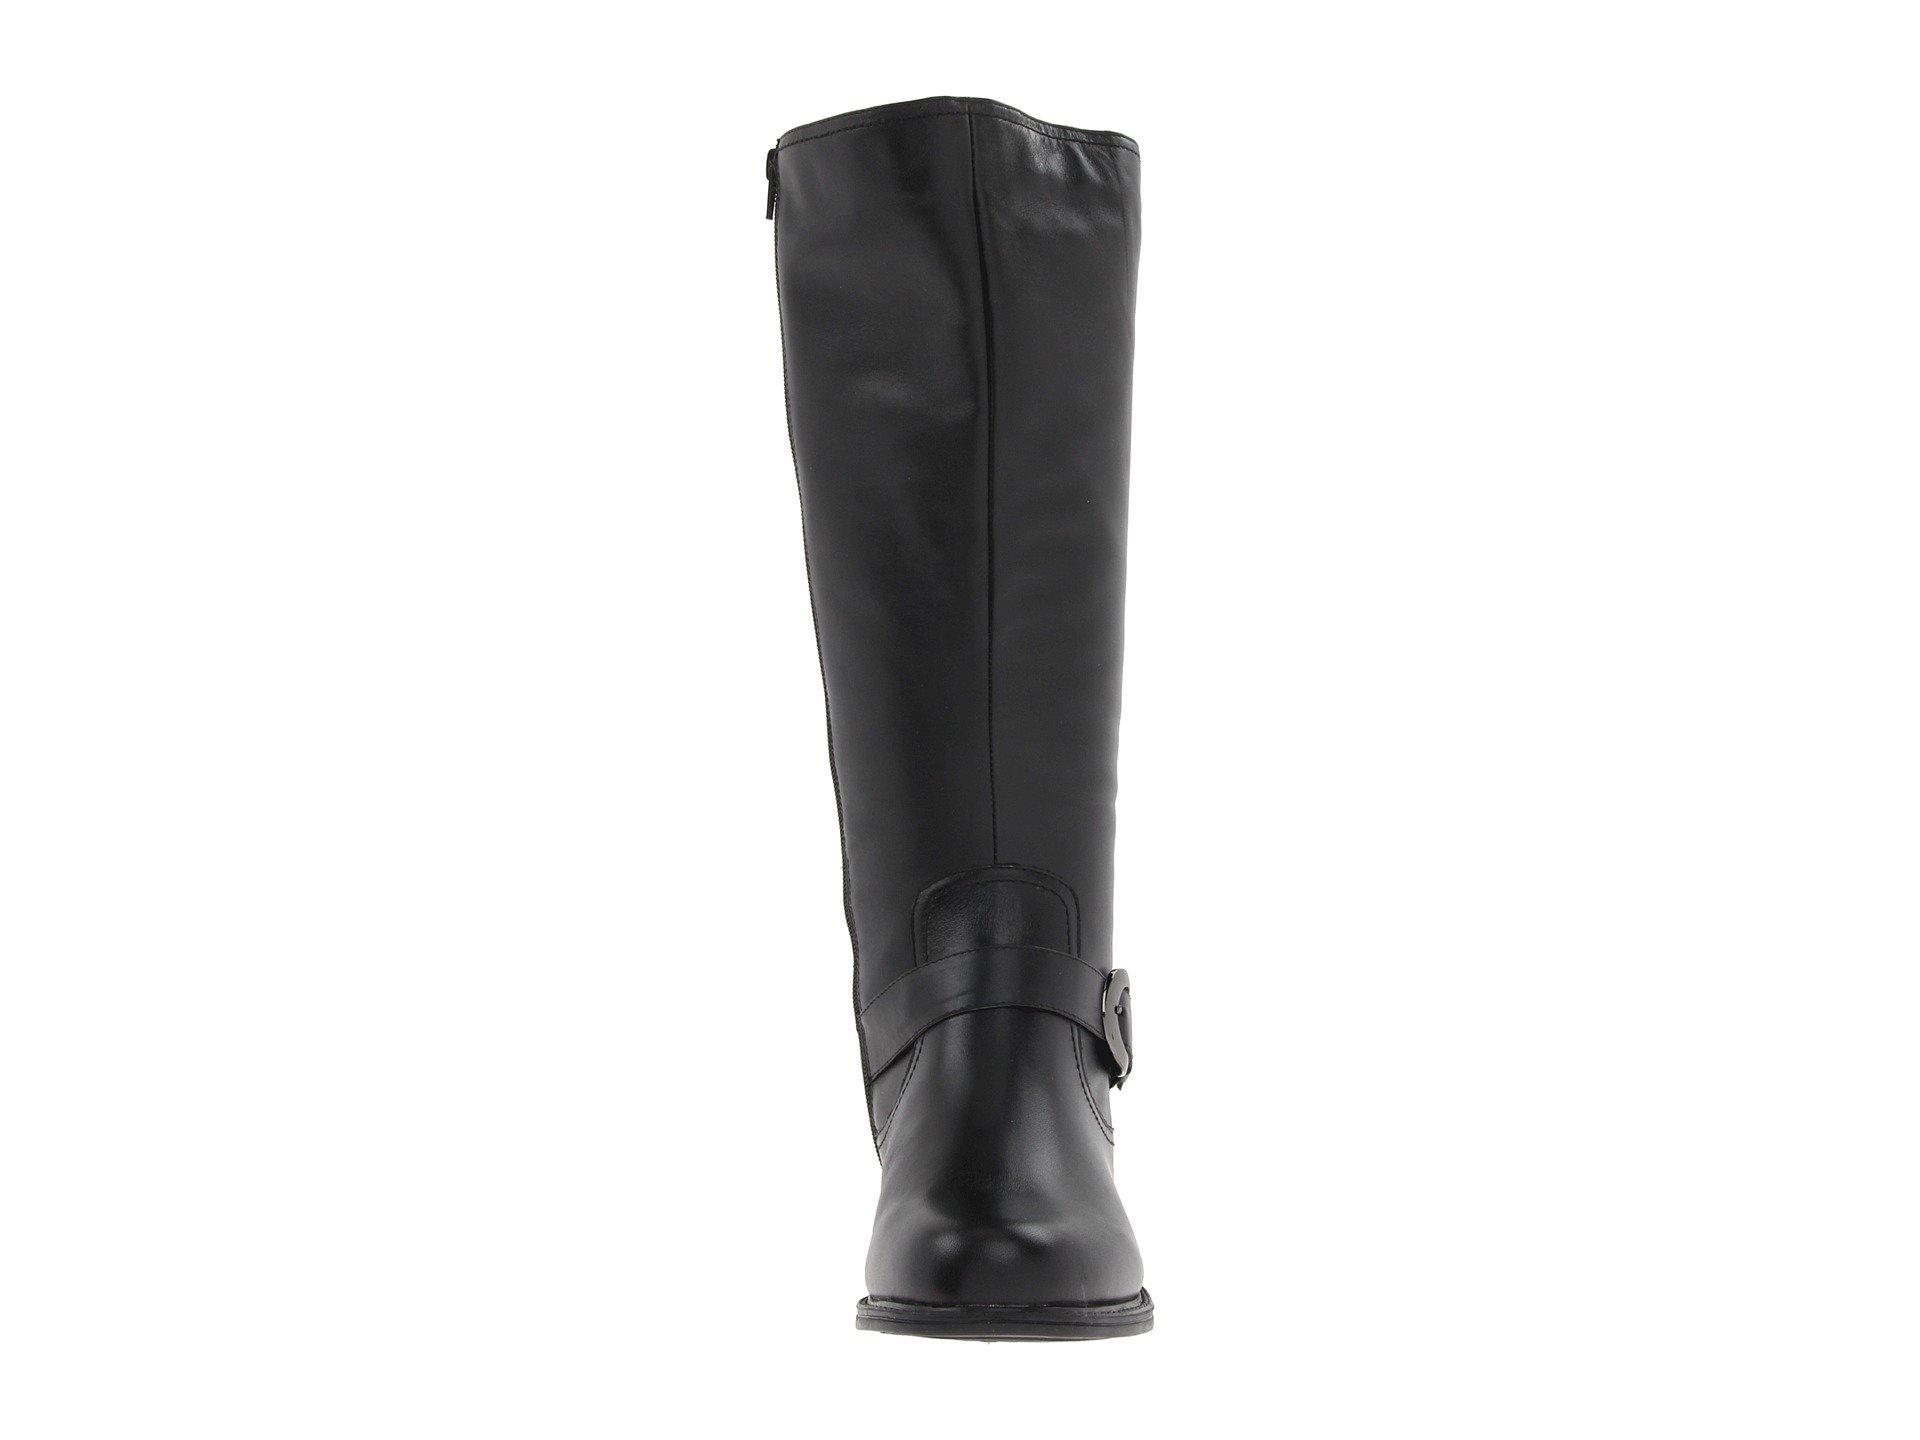 f2dde6007c35 David Tate - Branson - Extra Wide Shaft (black) Women s Boots - Lyst. View  fullscreen